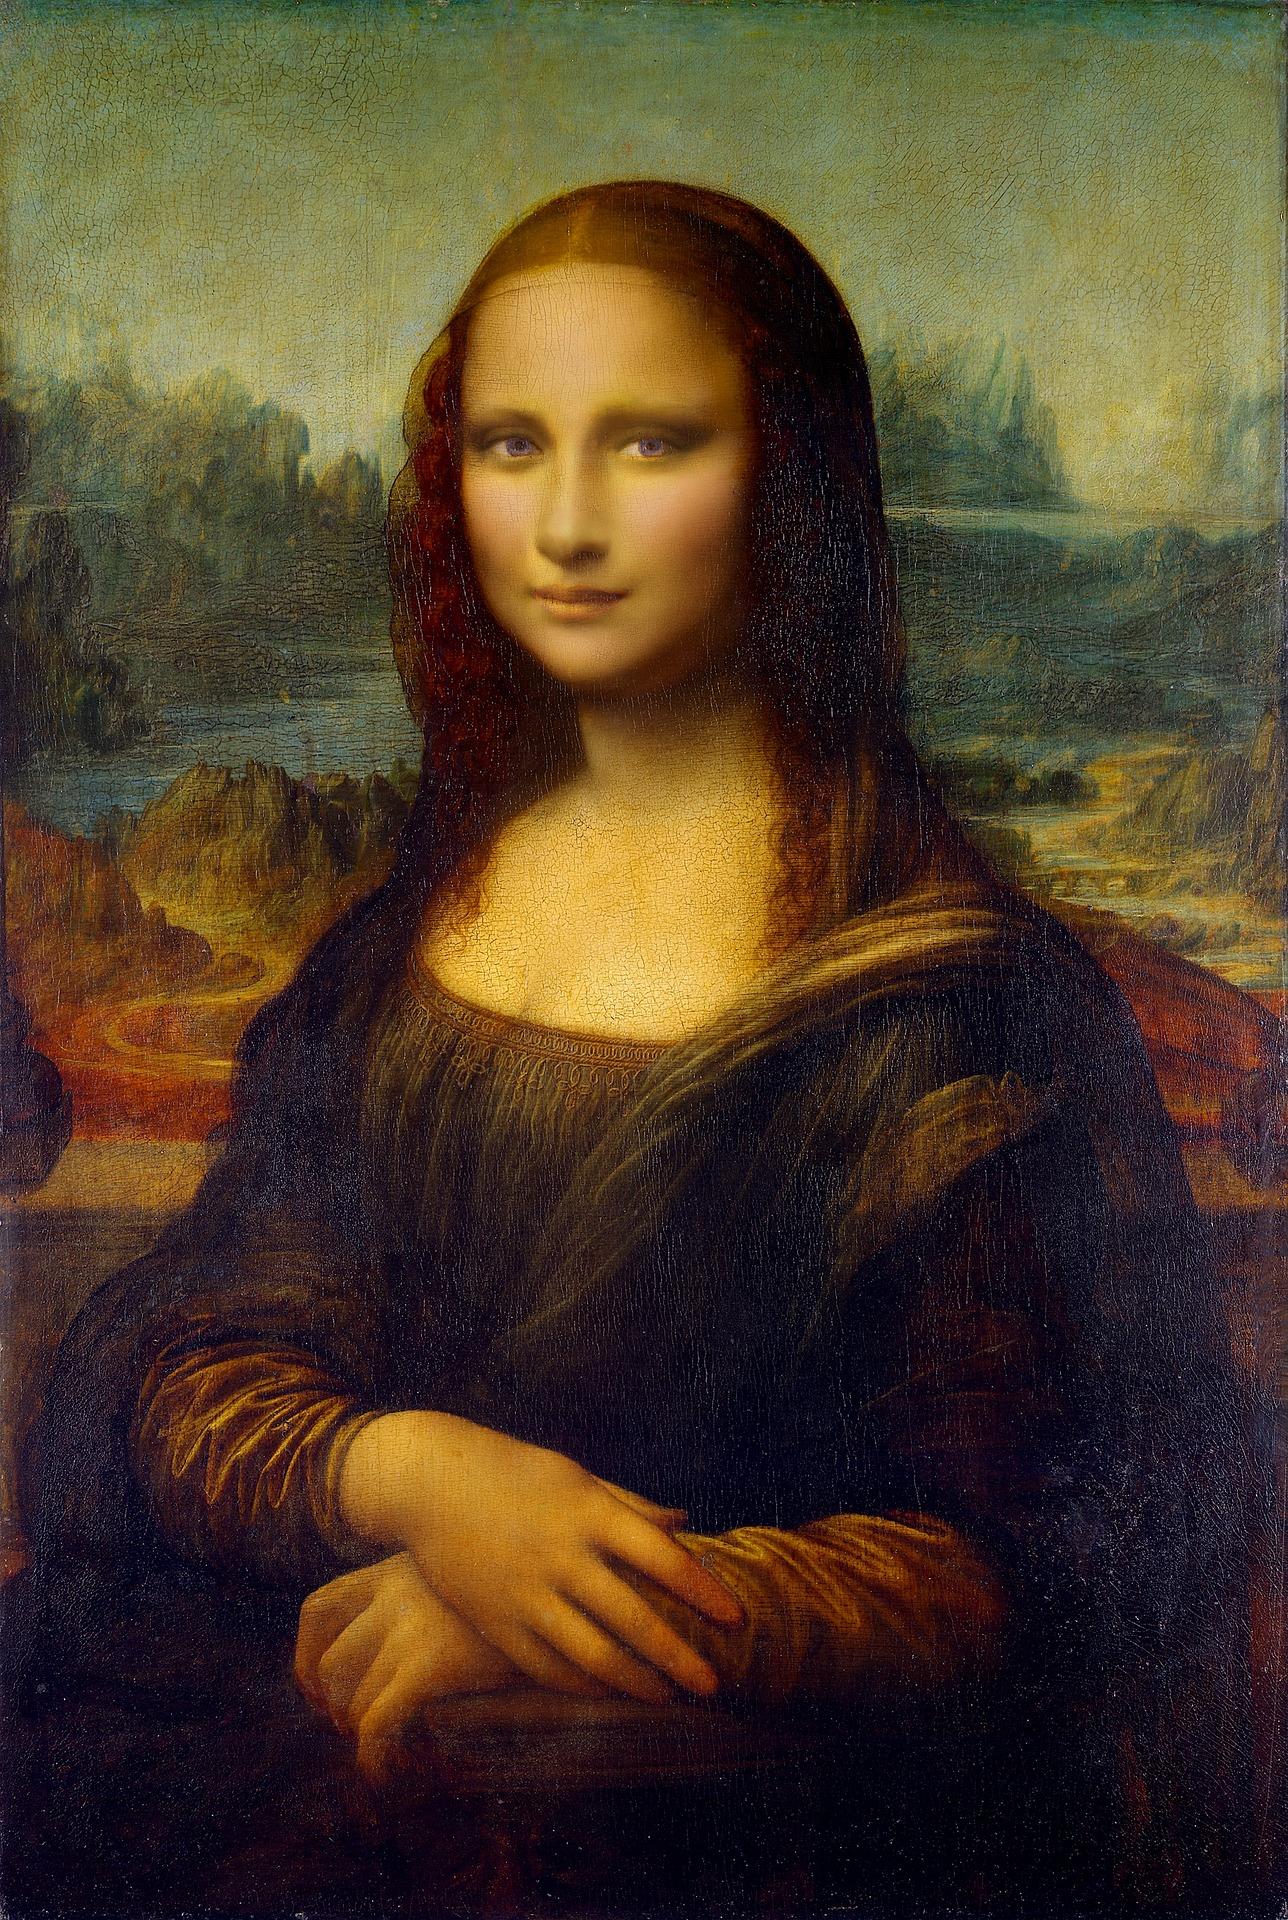 Mona Lisa (Zdroj: https://pixabay.com/en/mona-lisa-painting-leonardo-da-vinci-1846585/)